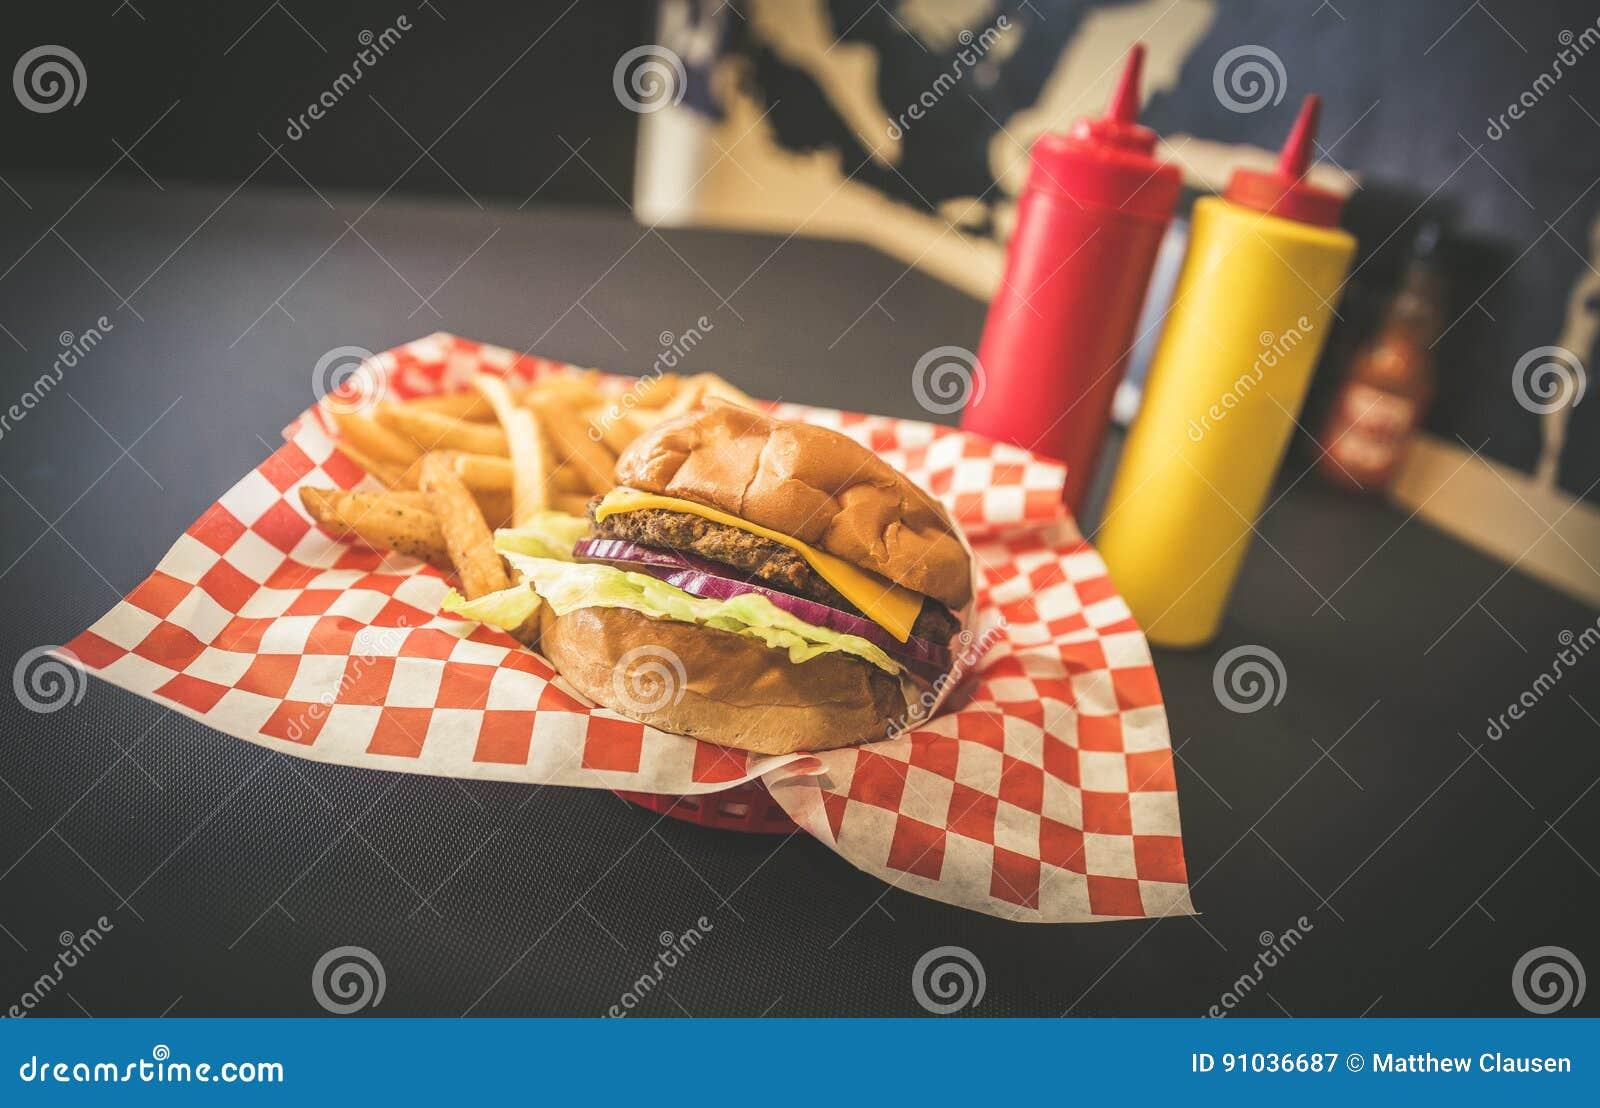 Hamburguesa y fritadas